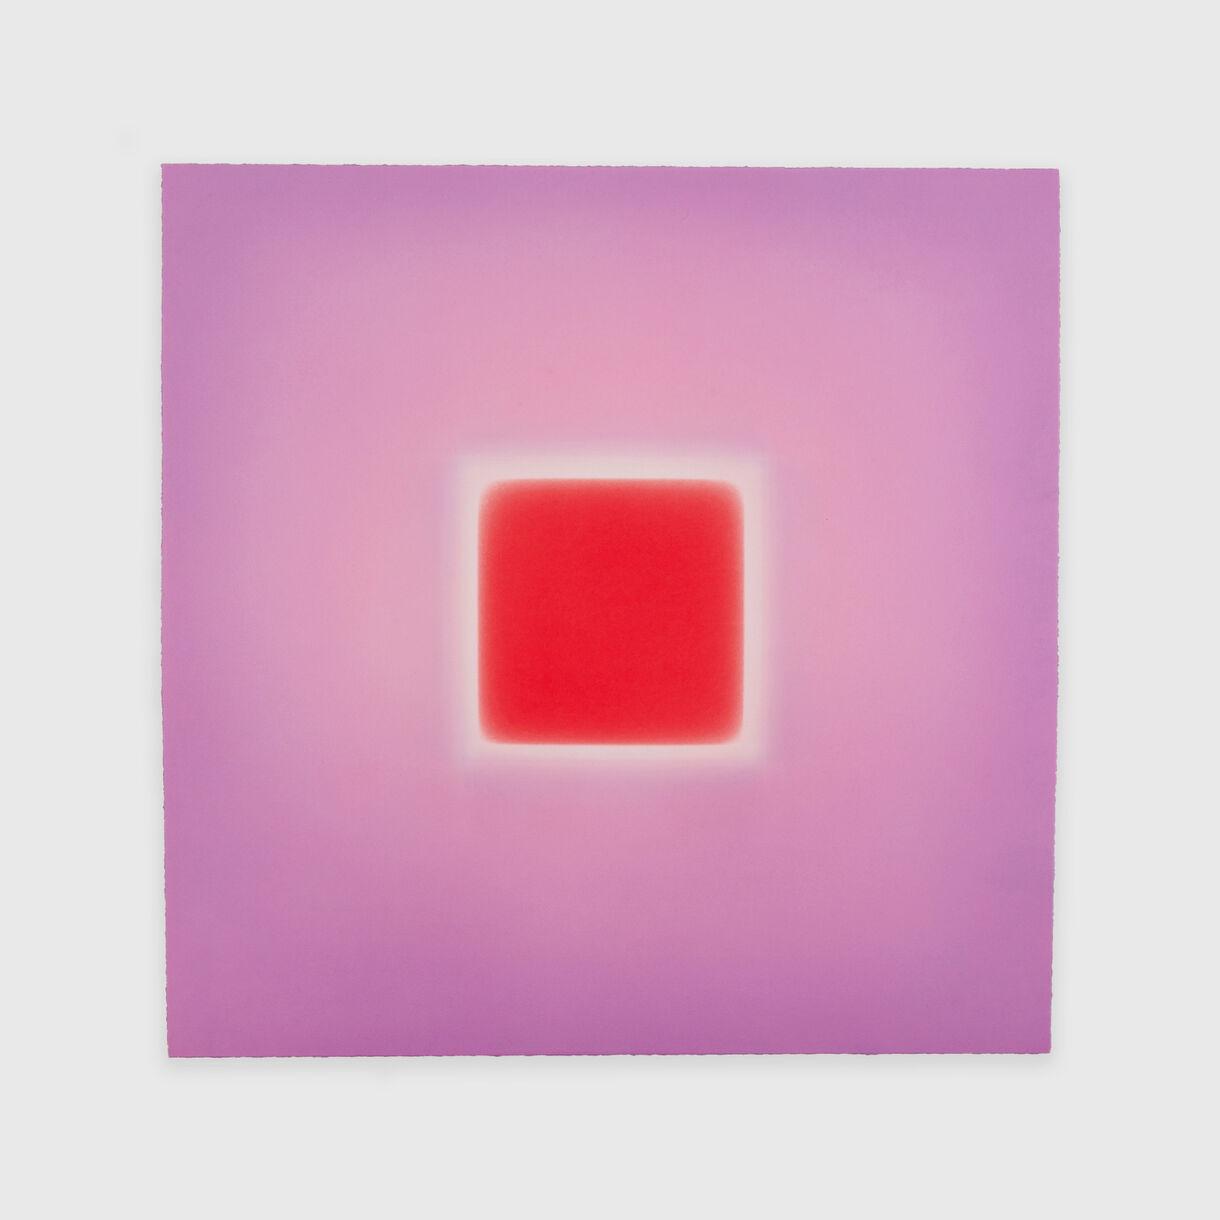 Eclipsed, Brian Eno